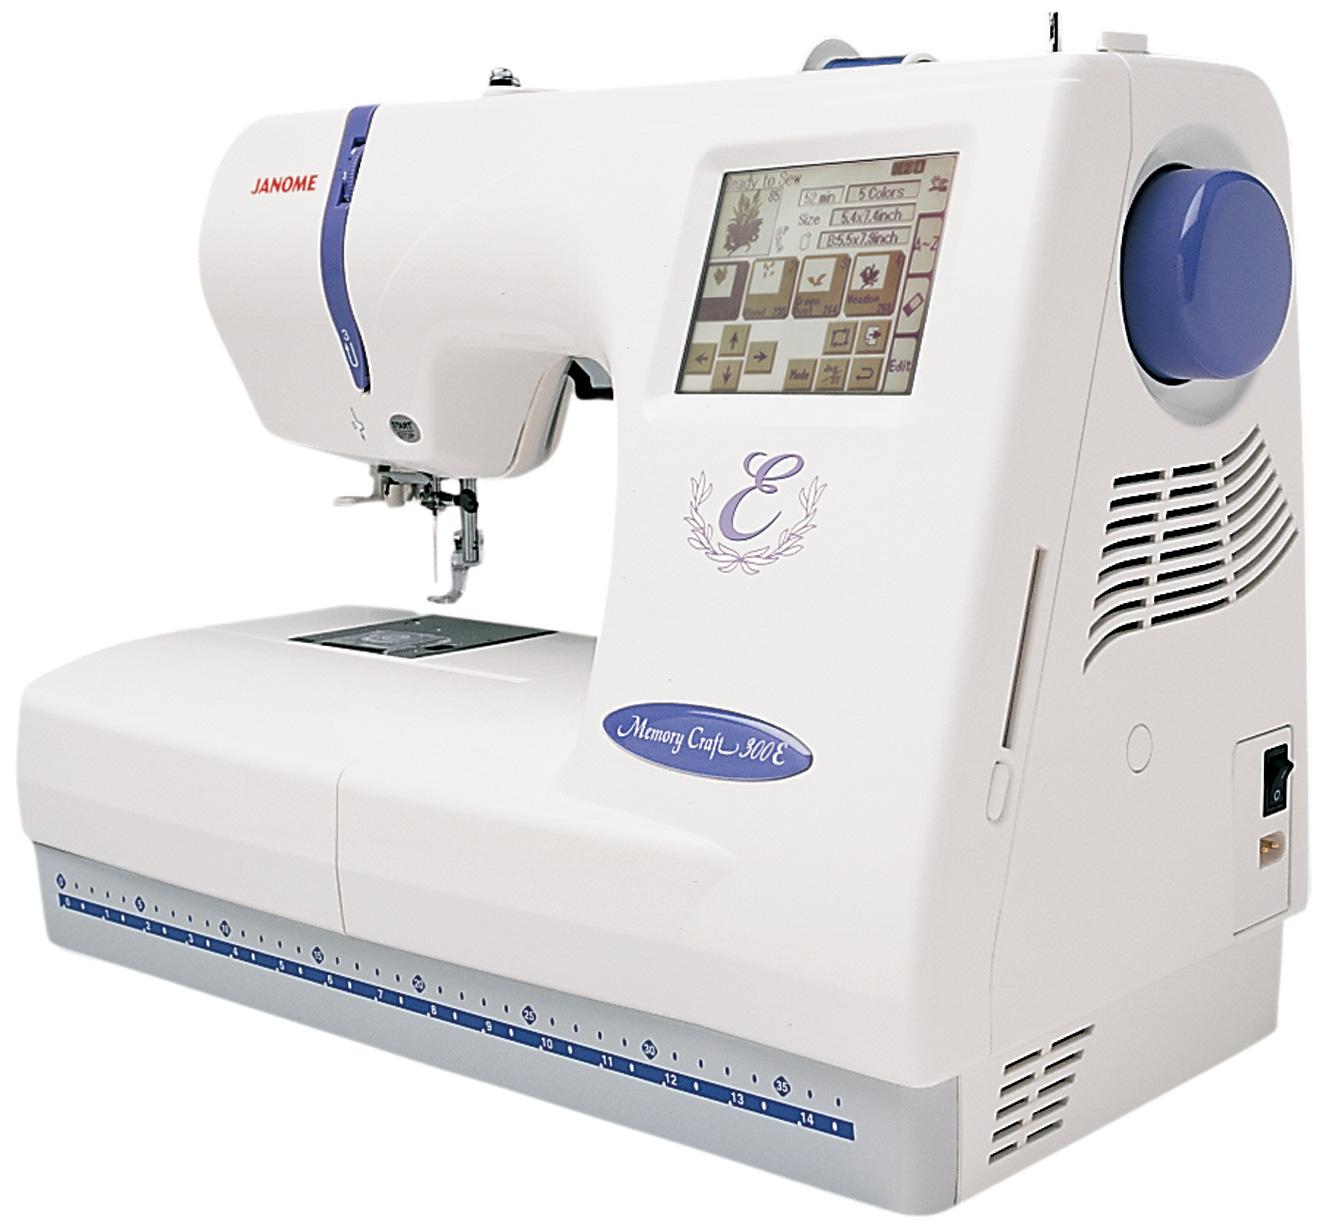 Janome memory craft e mc embroidery machine w